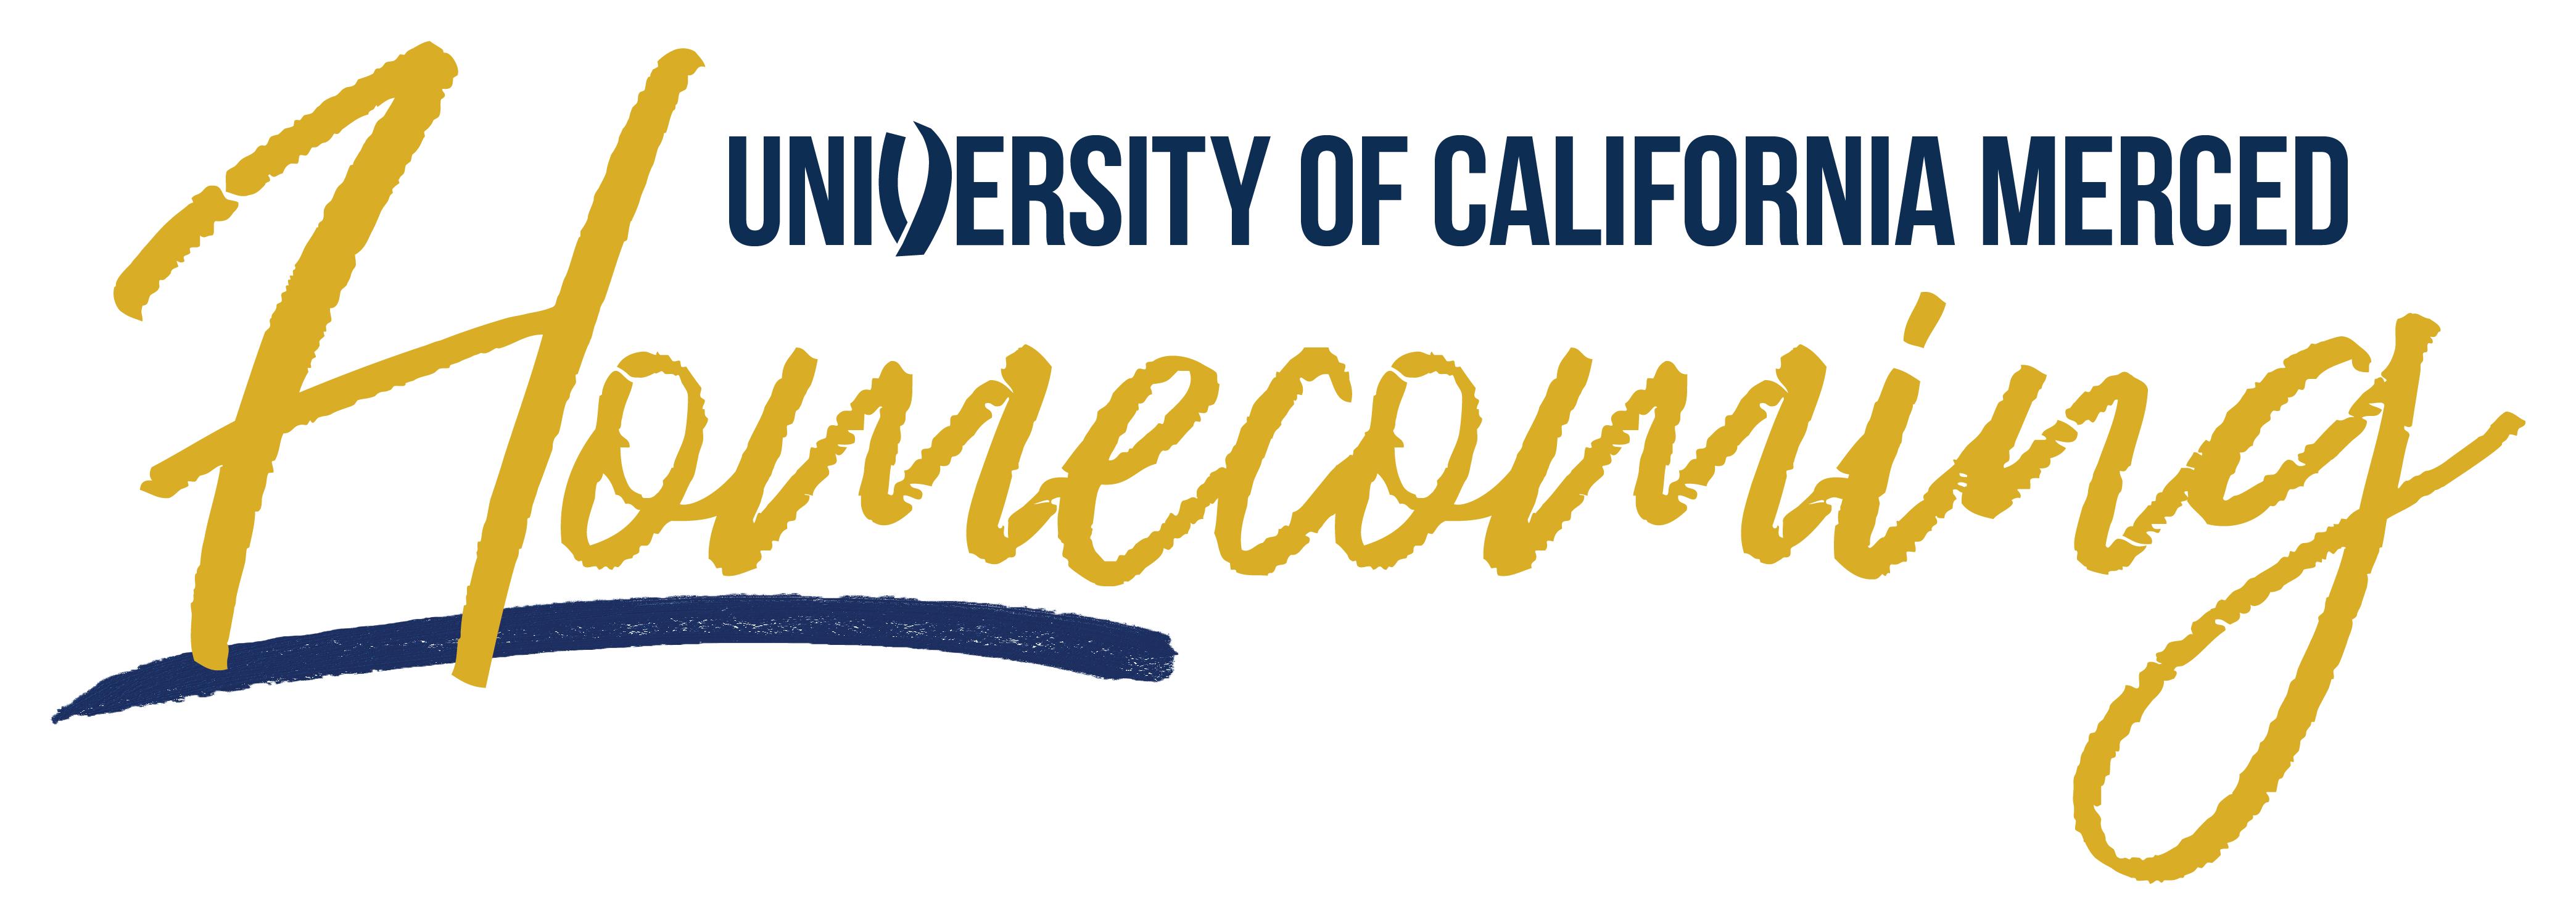 UC Merced Homecoming 2020